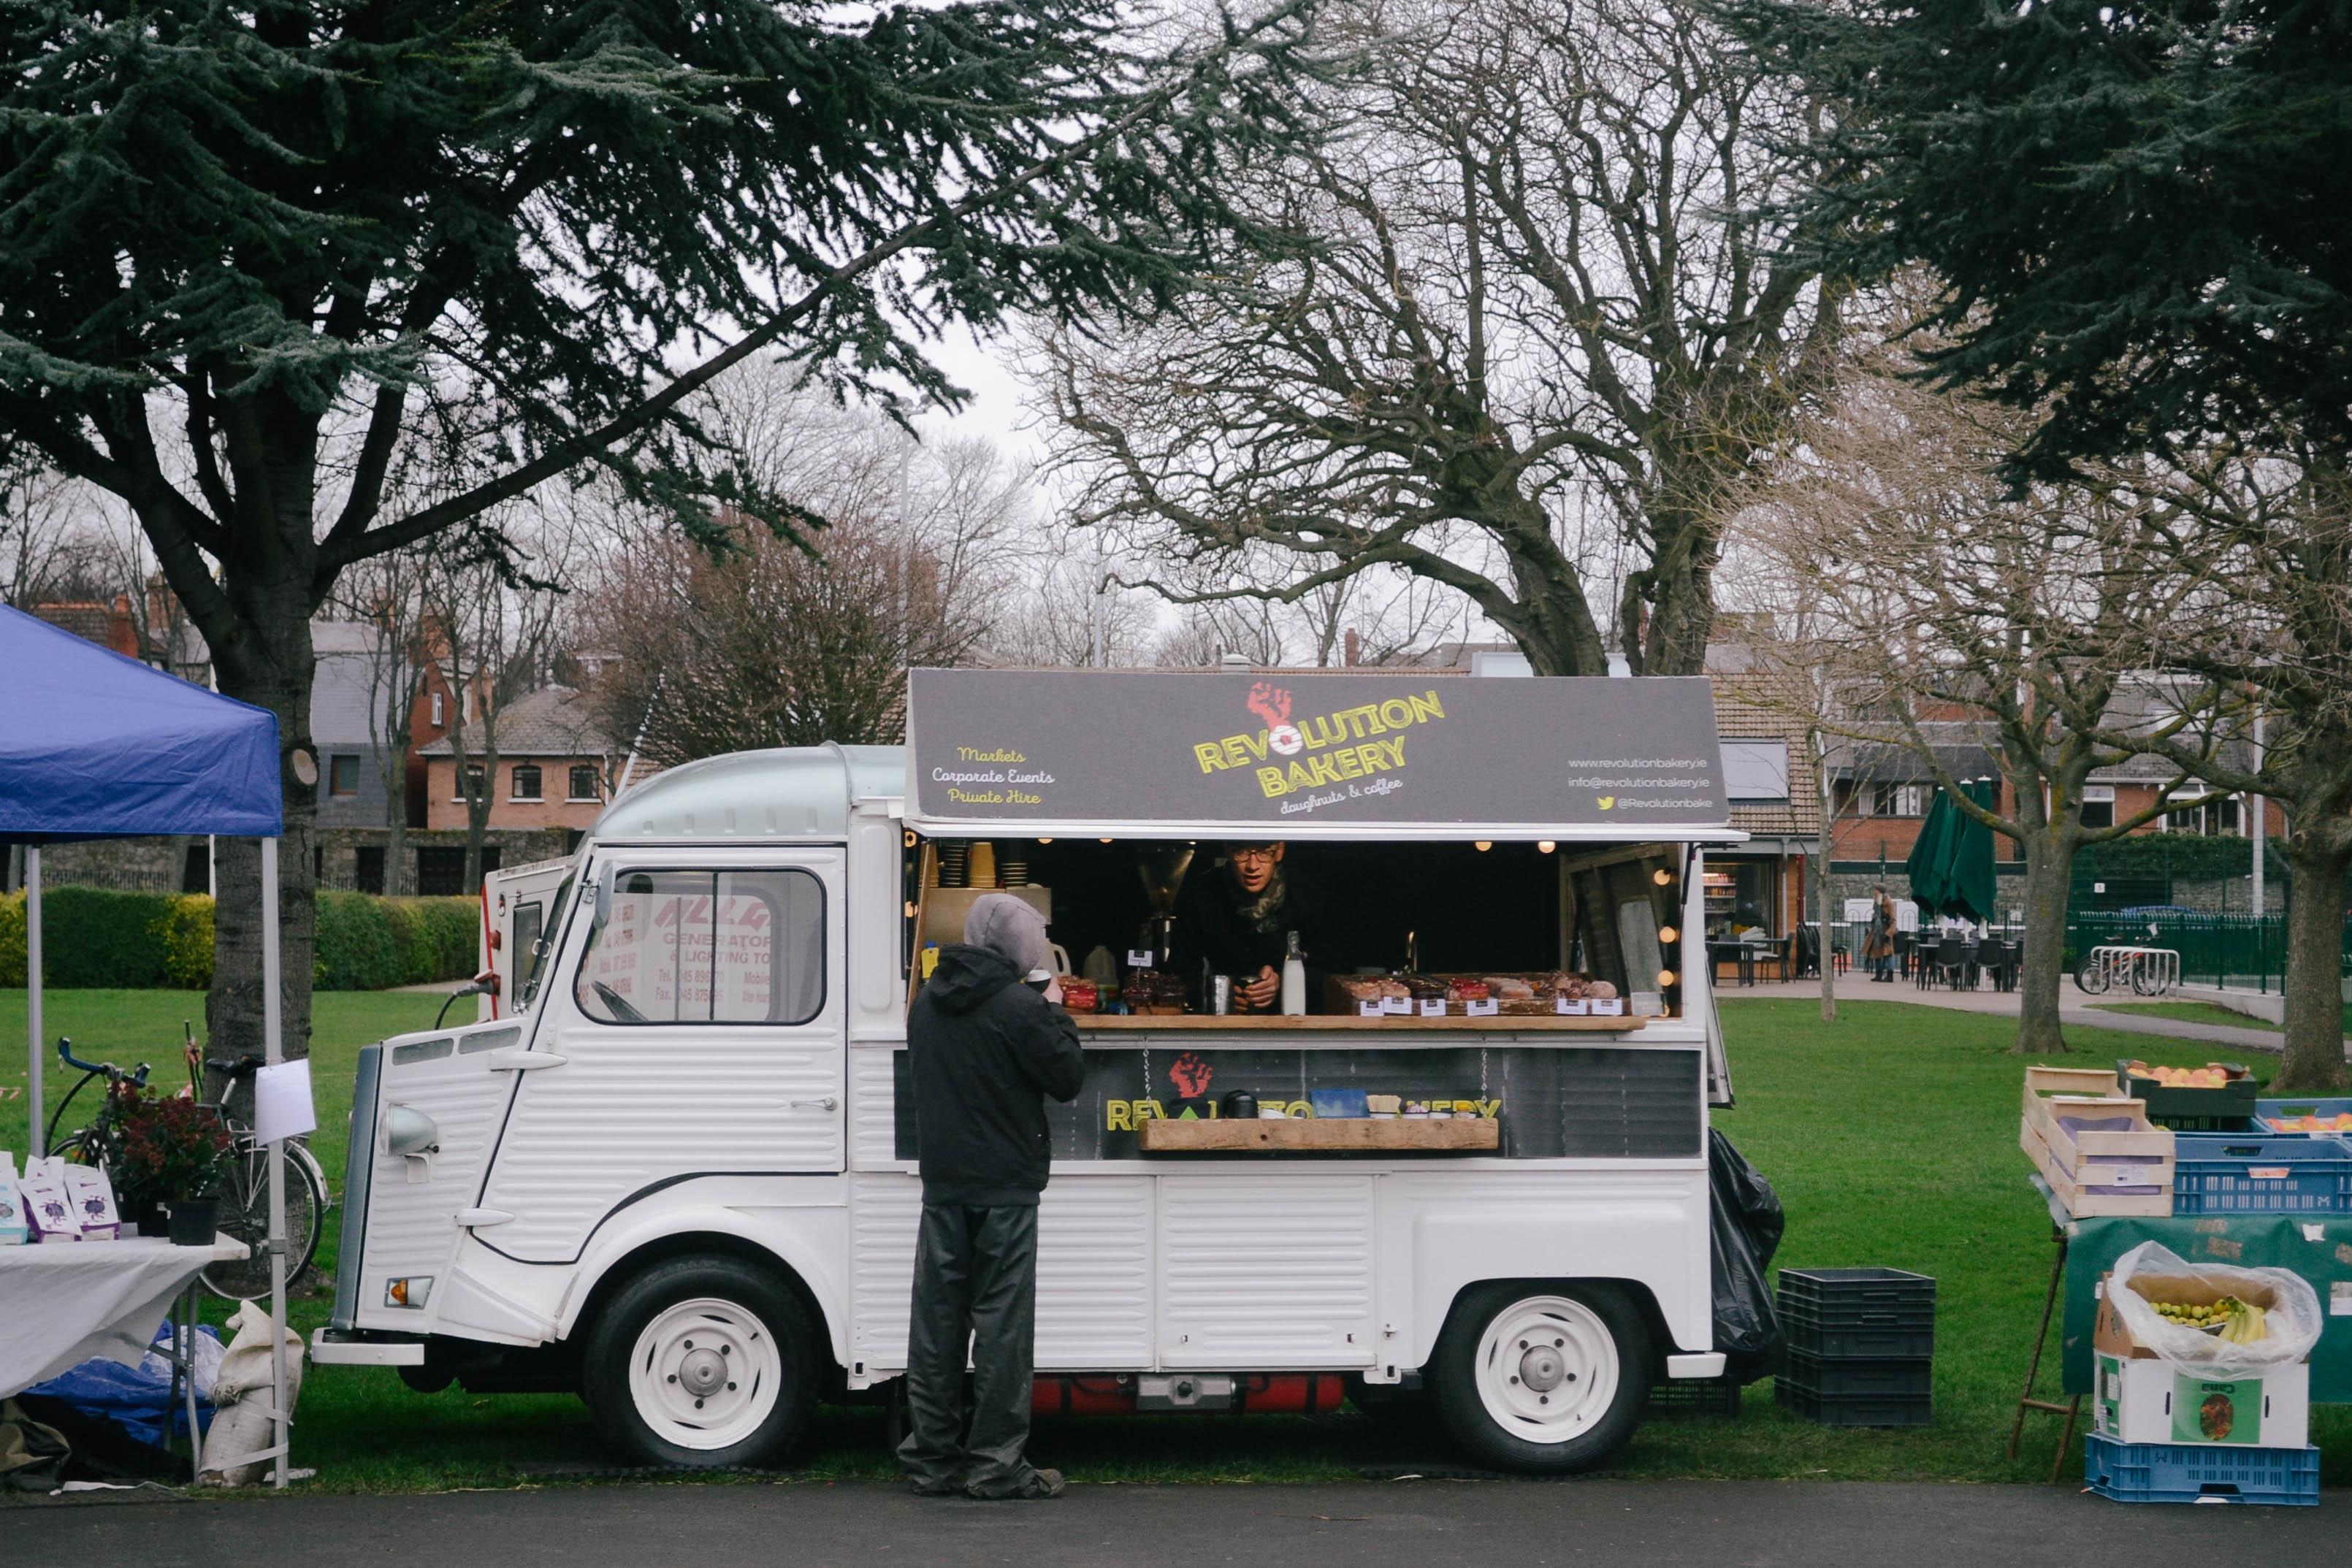 feira-comida-market-herbert-park-ballsbridge-passeio-domingo-sunday-food-park-dublin-ireland-irlanda-dicas_-26